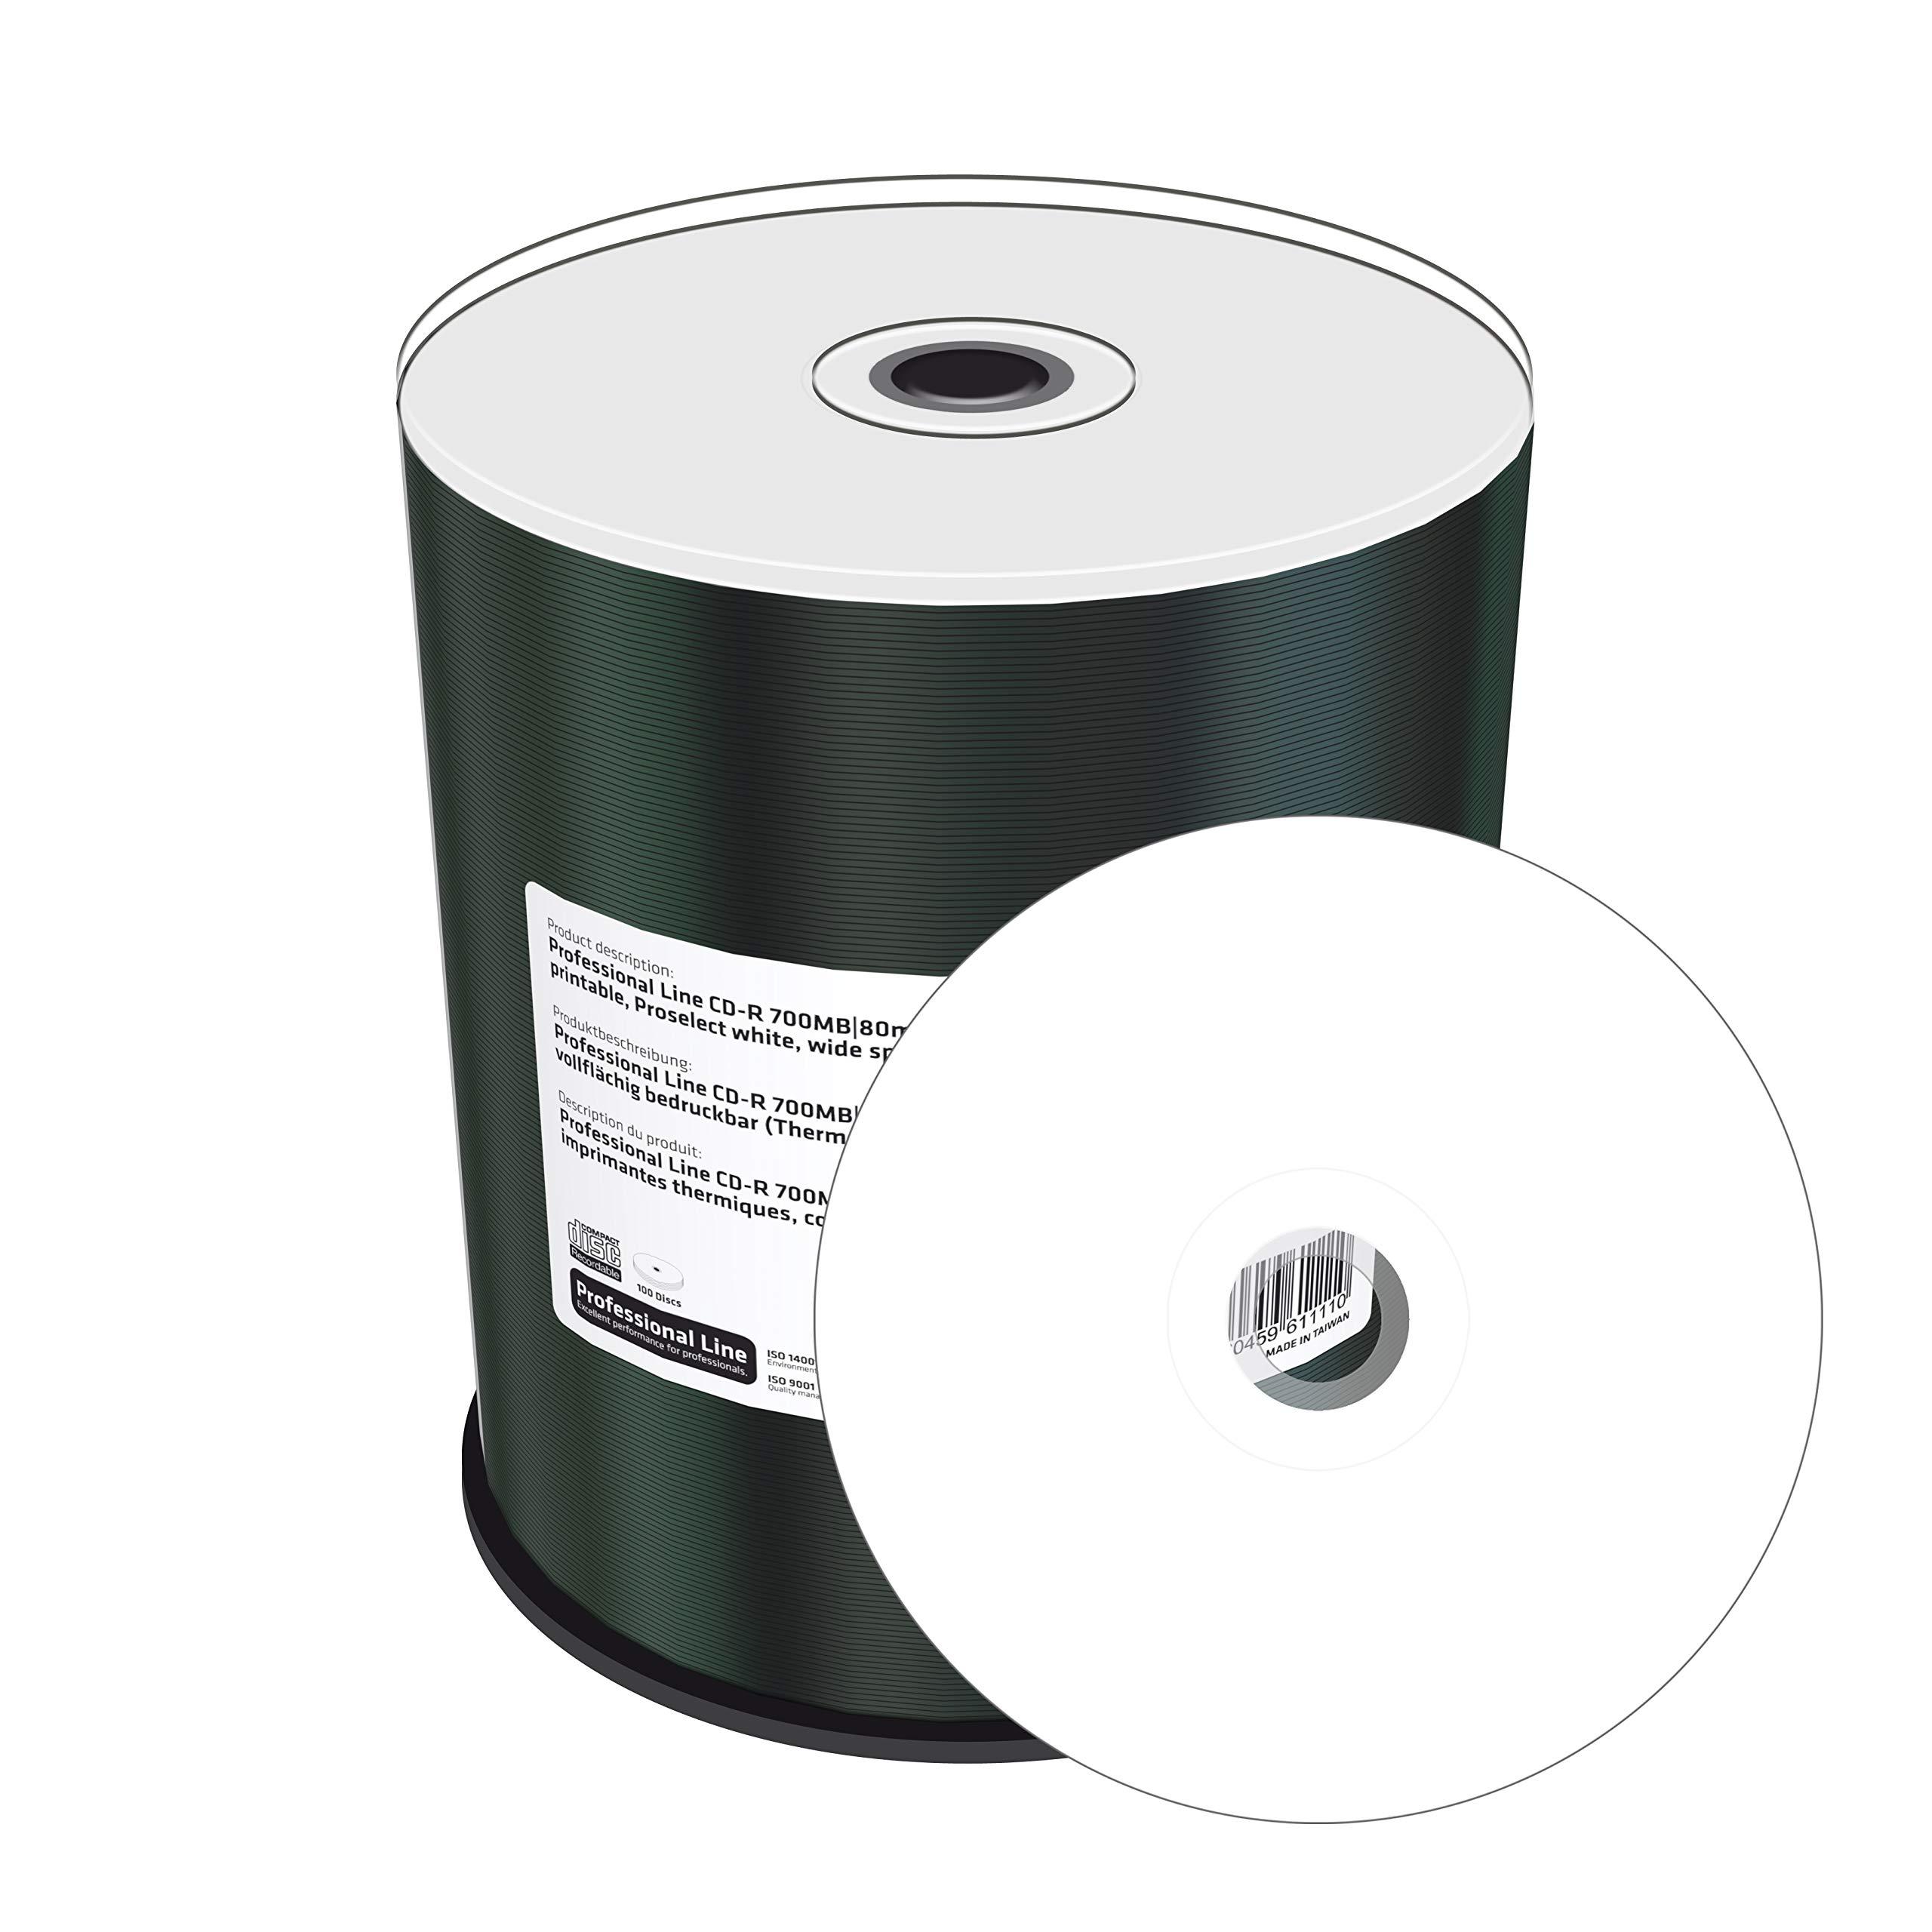 MediaRange 700MB, CD-R, 100 Pack 100 Pieza(s) - CD-RW vírgenes (CD ...